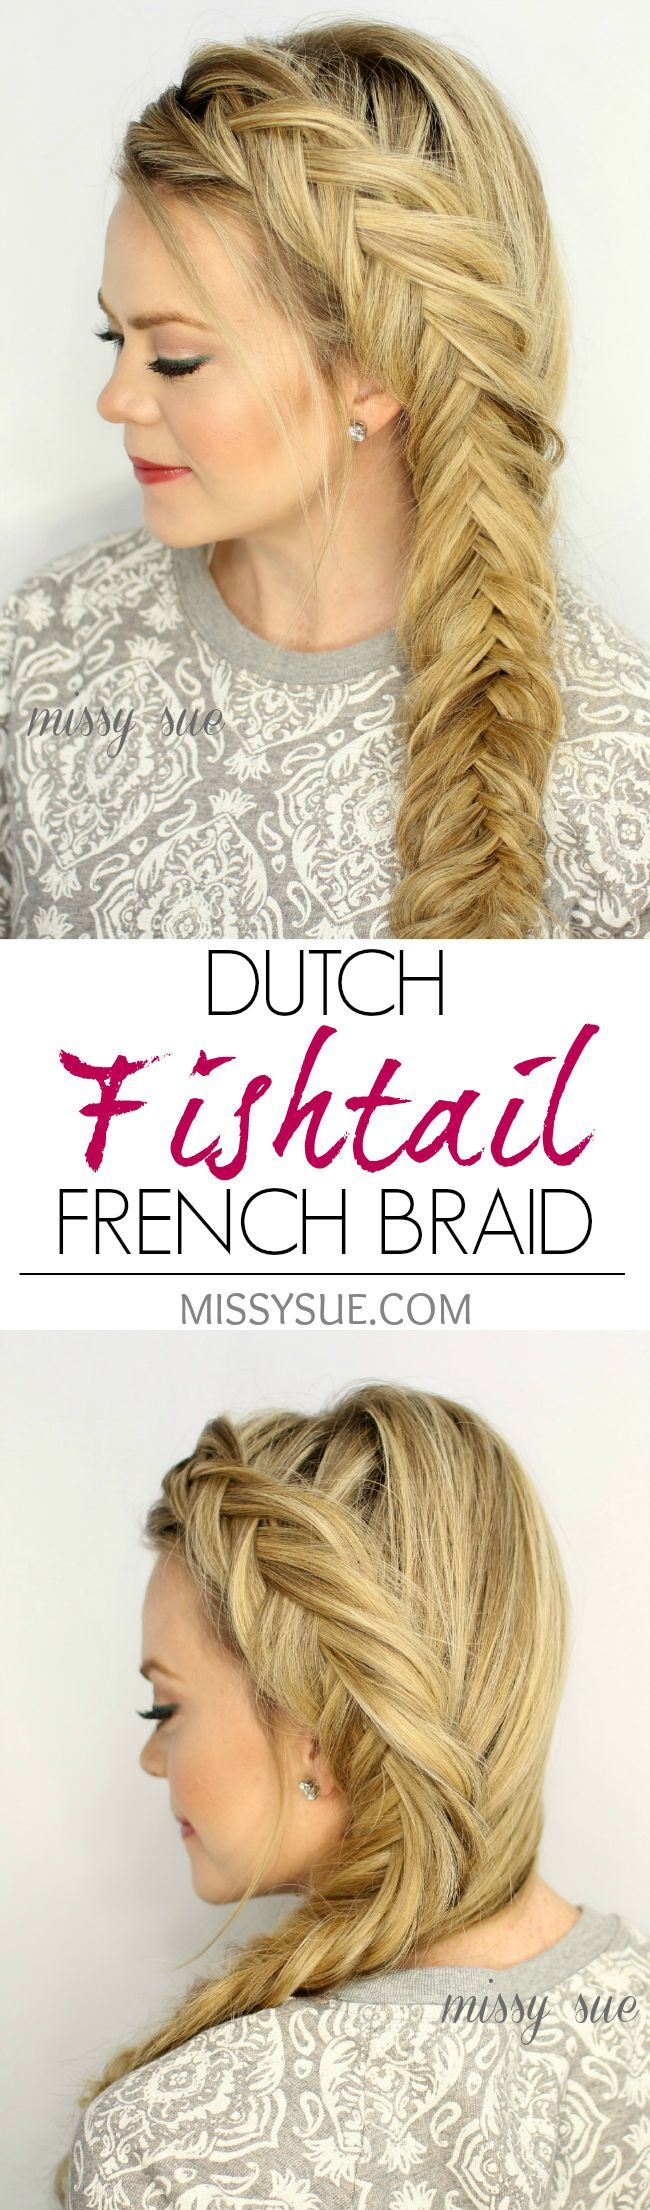 cute straight hairstyles new season hair styles fishtail